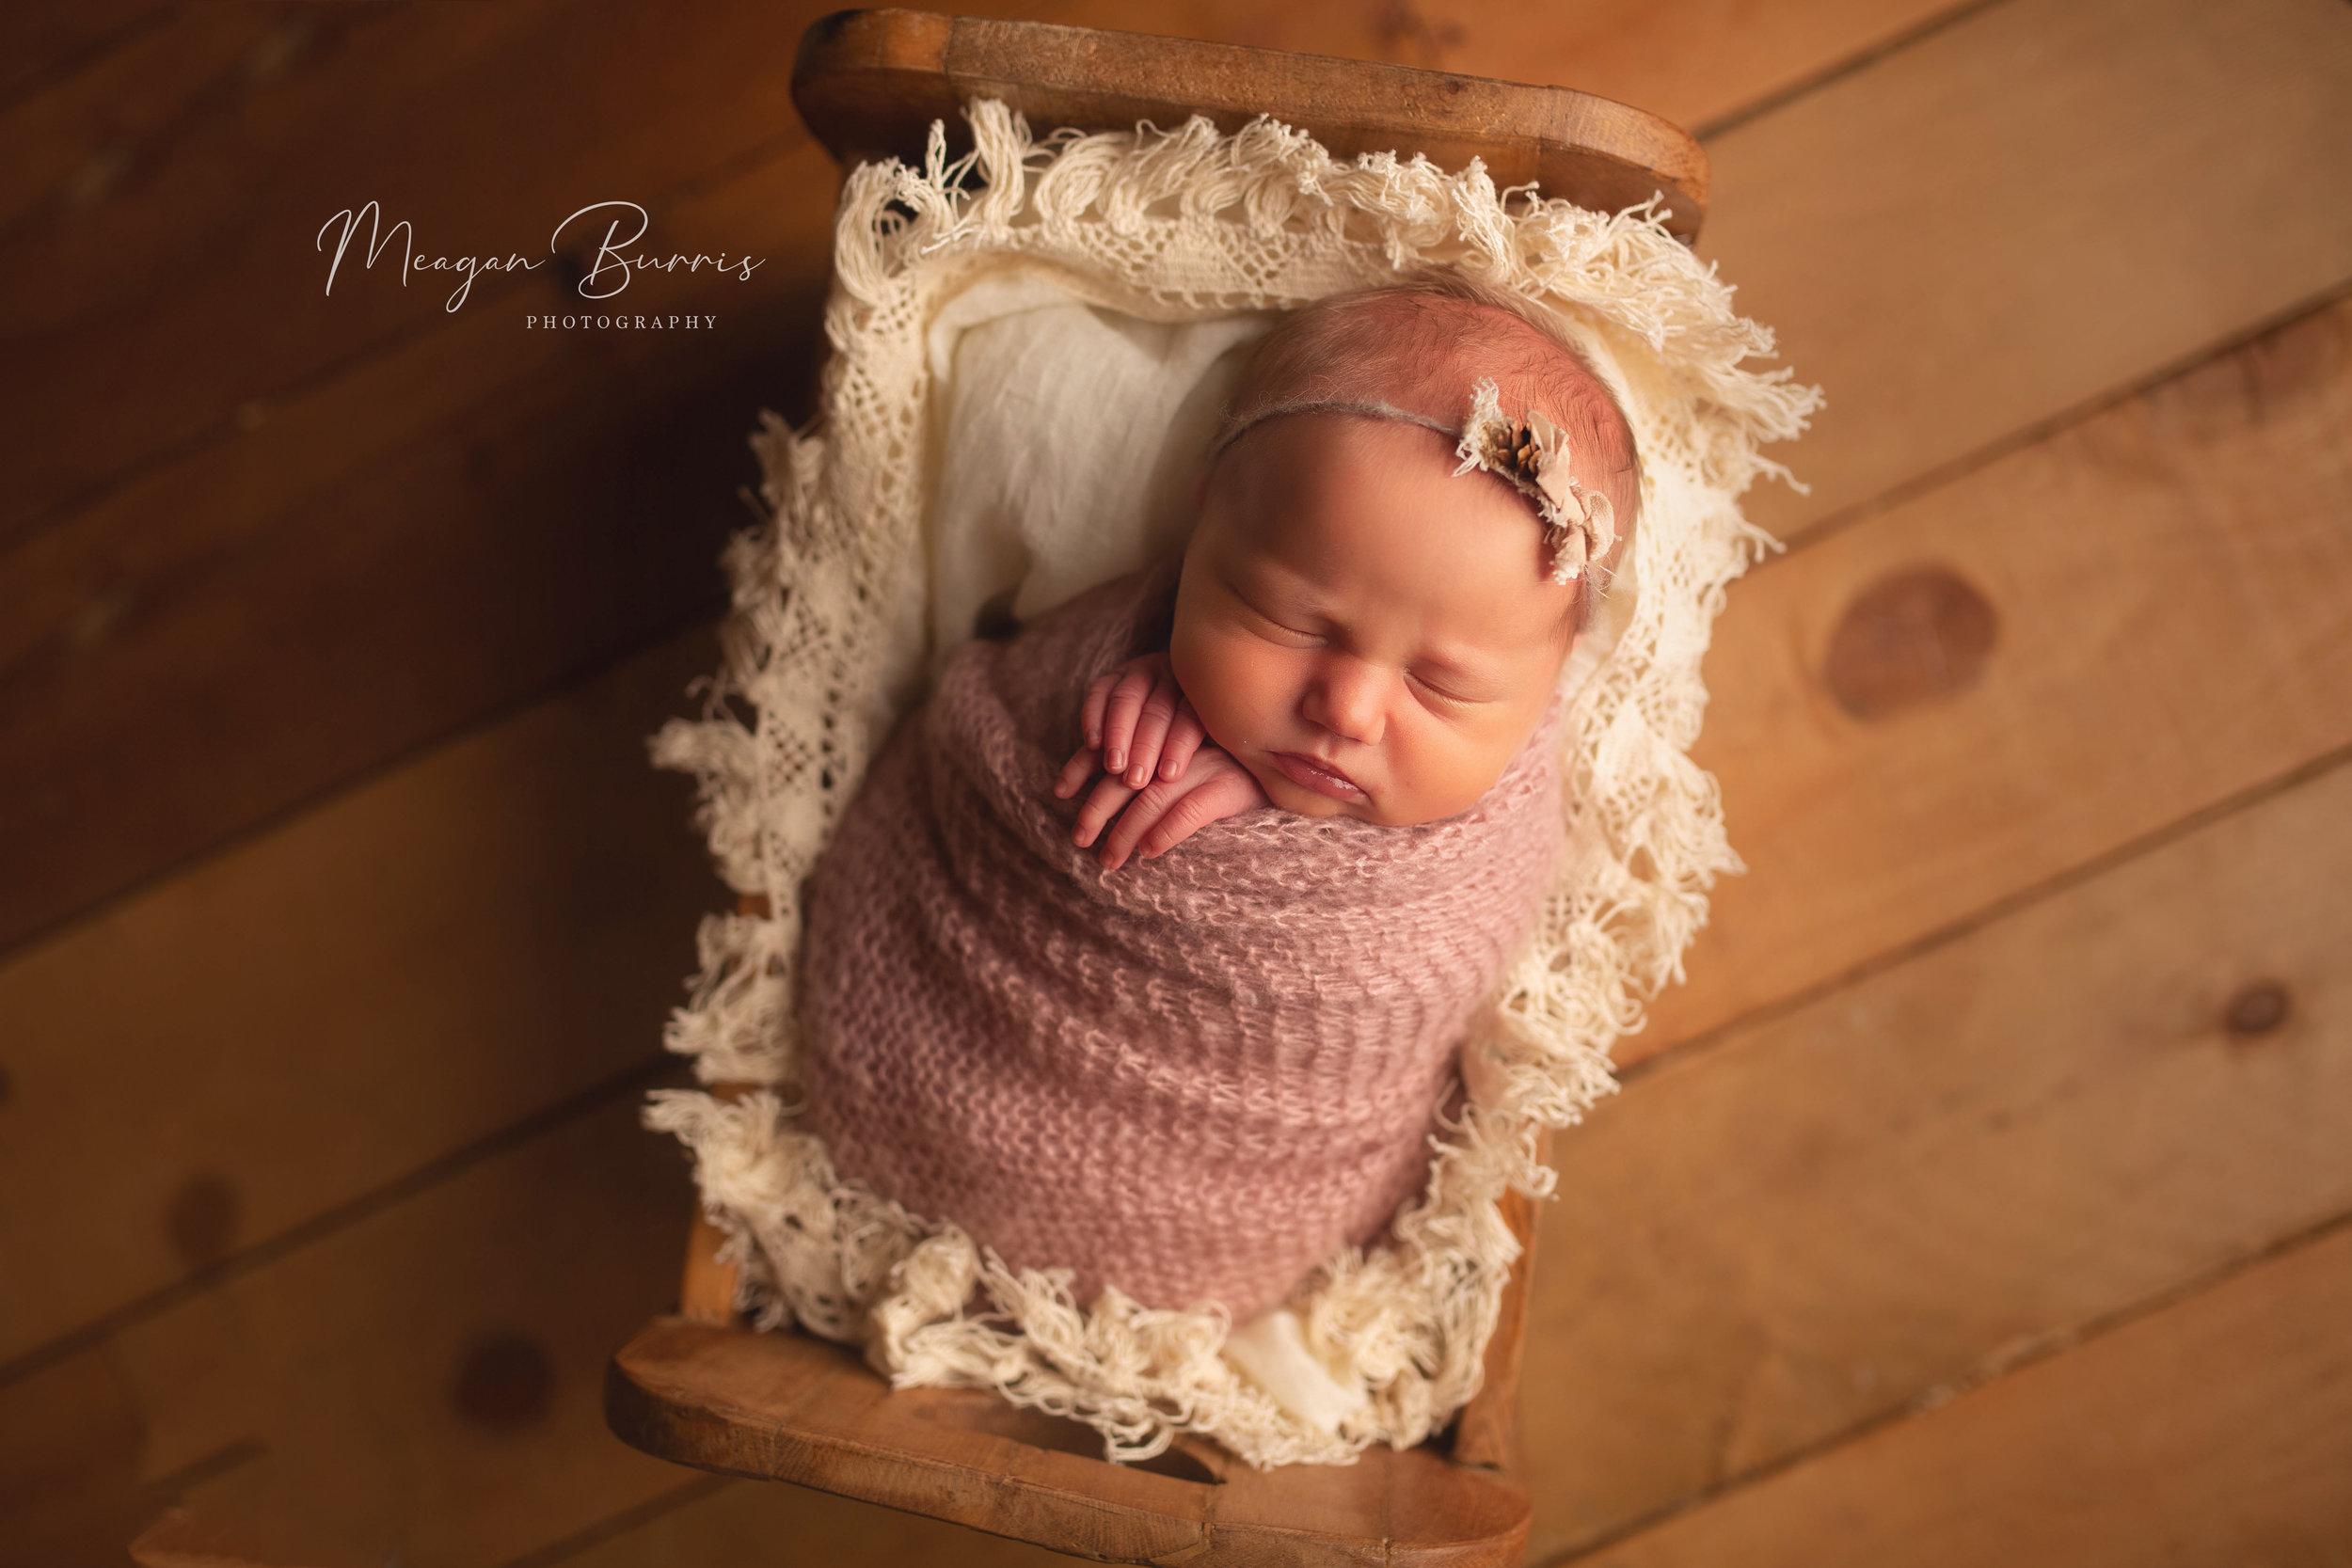 vera_rose_carmel indiana newborn photographer5.jpg